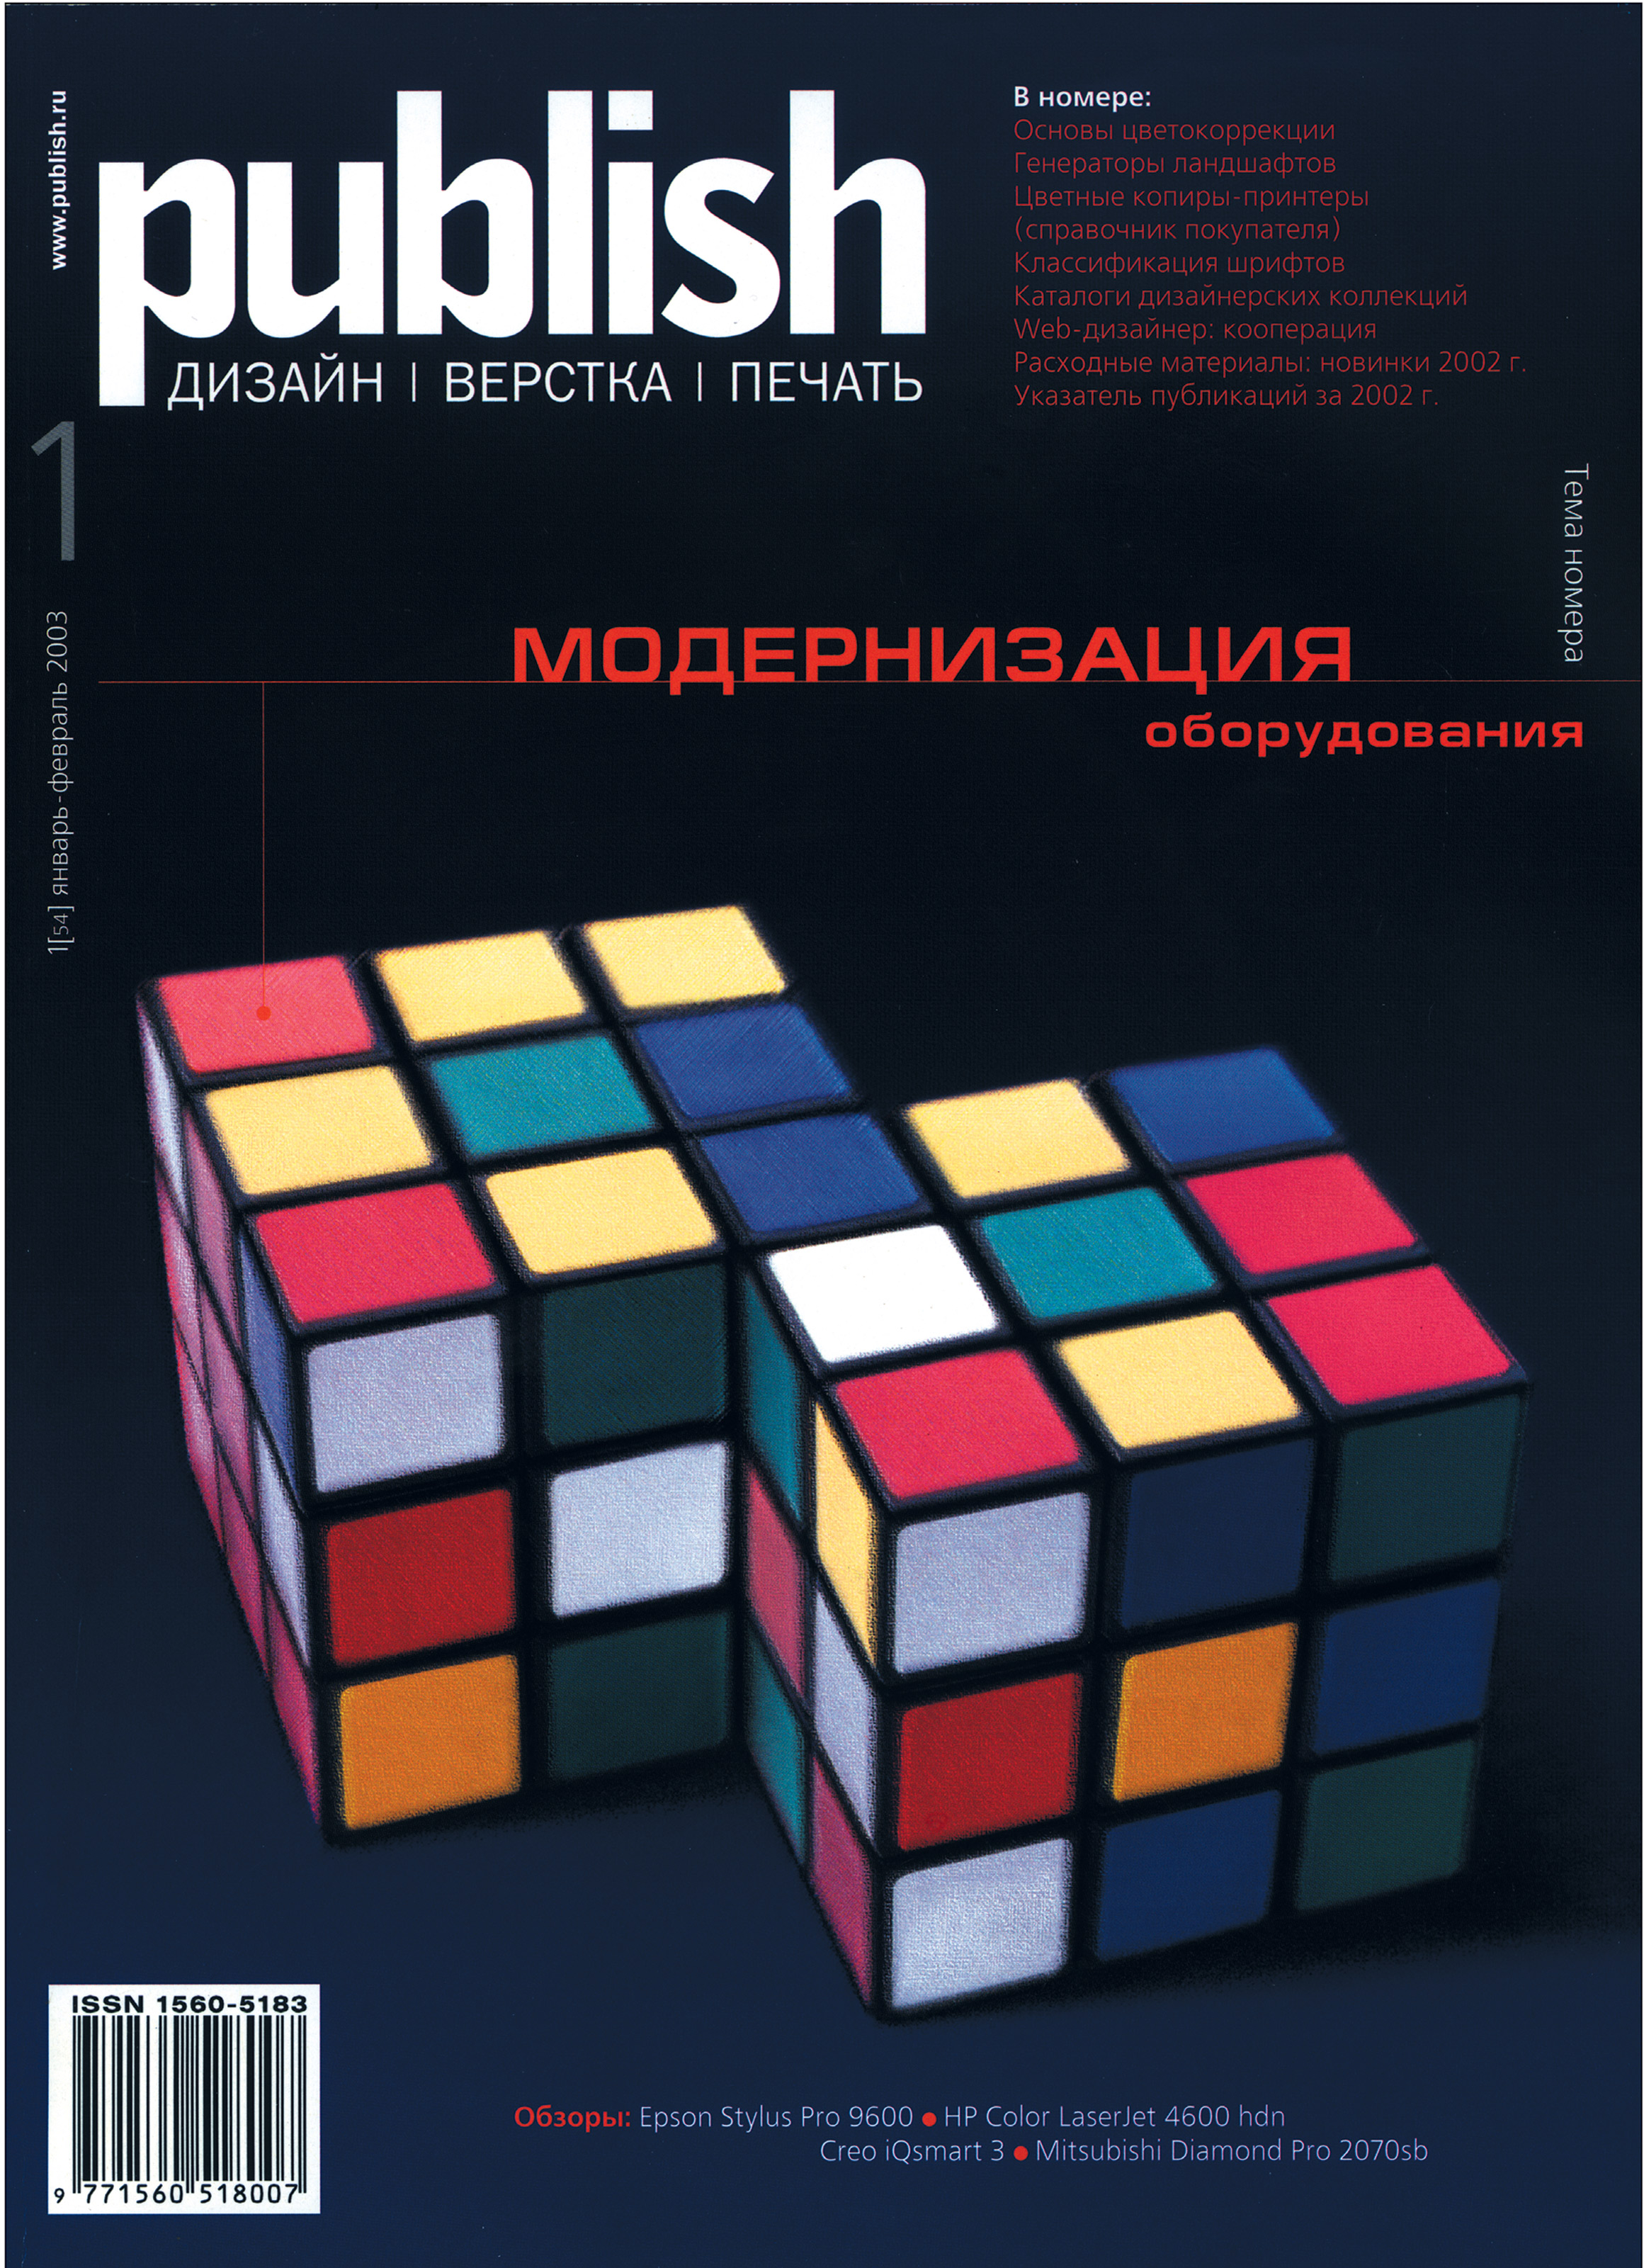 Журнал Publish выпуск 01, 2003